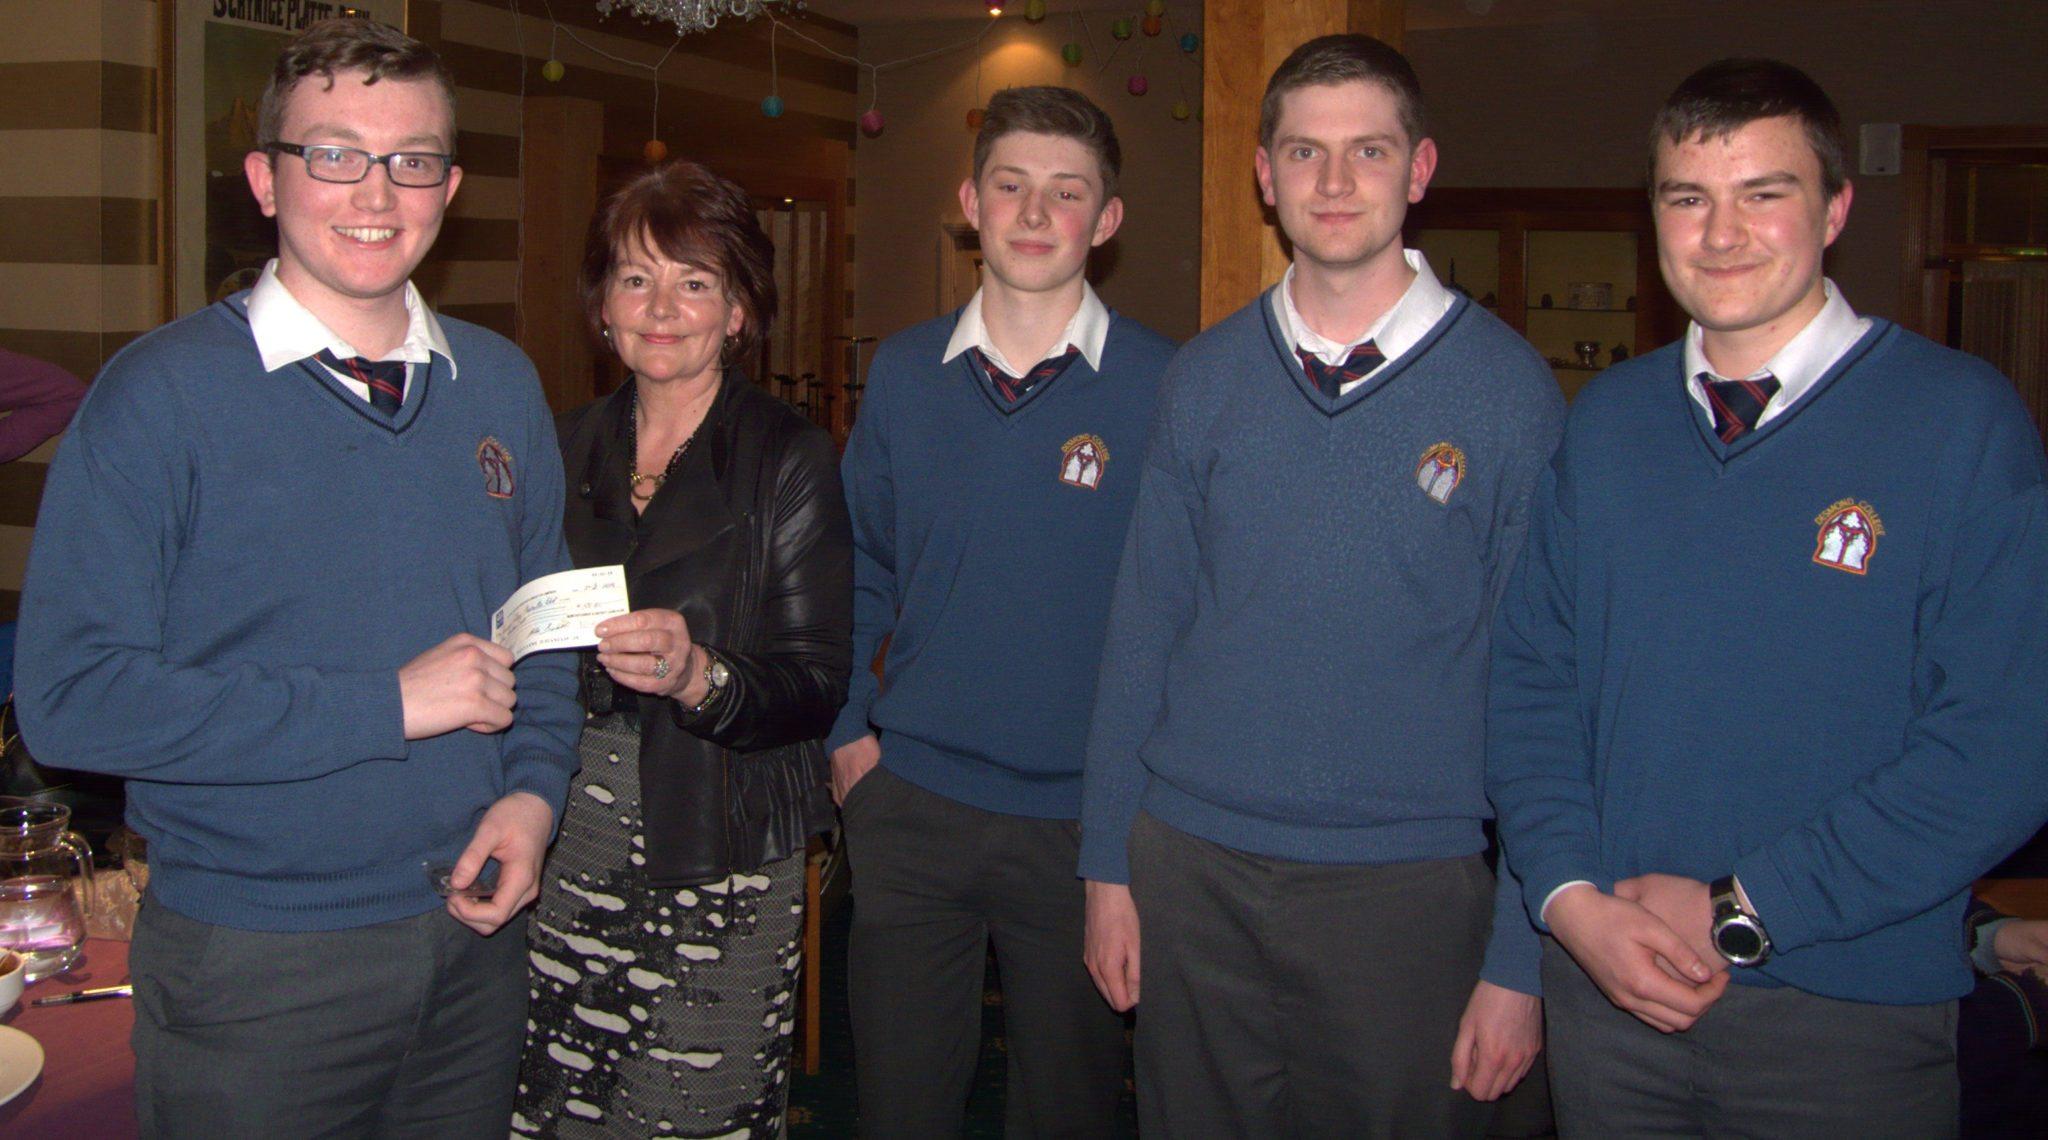 Desmond College, Newcastle West Senior winners